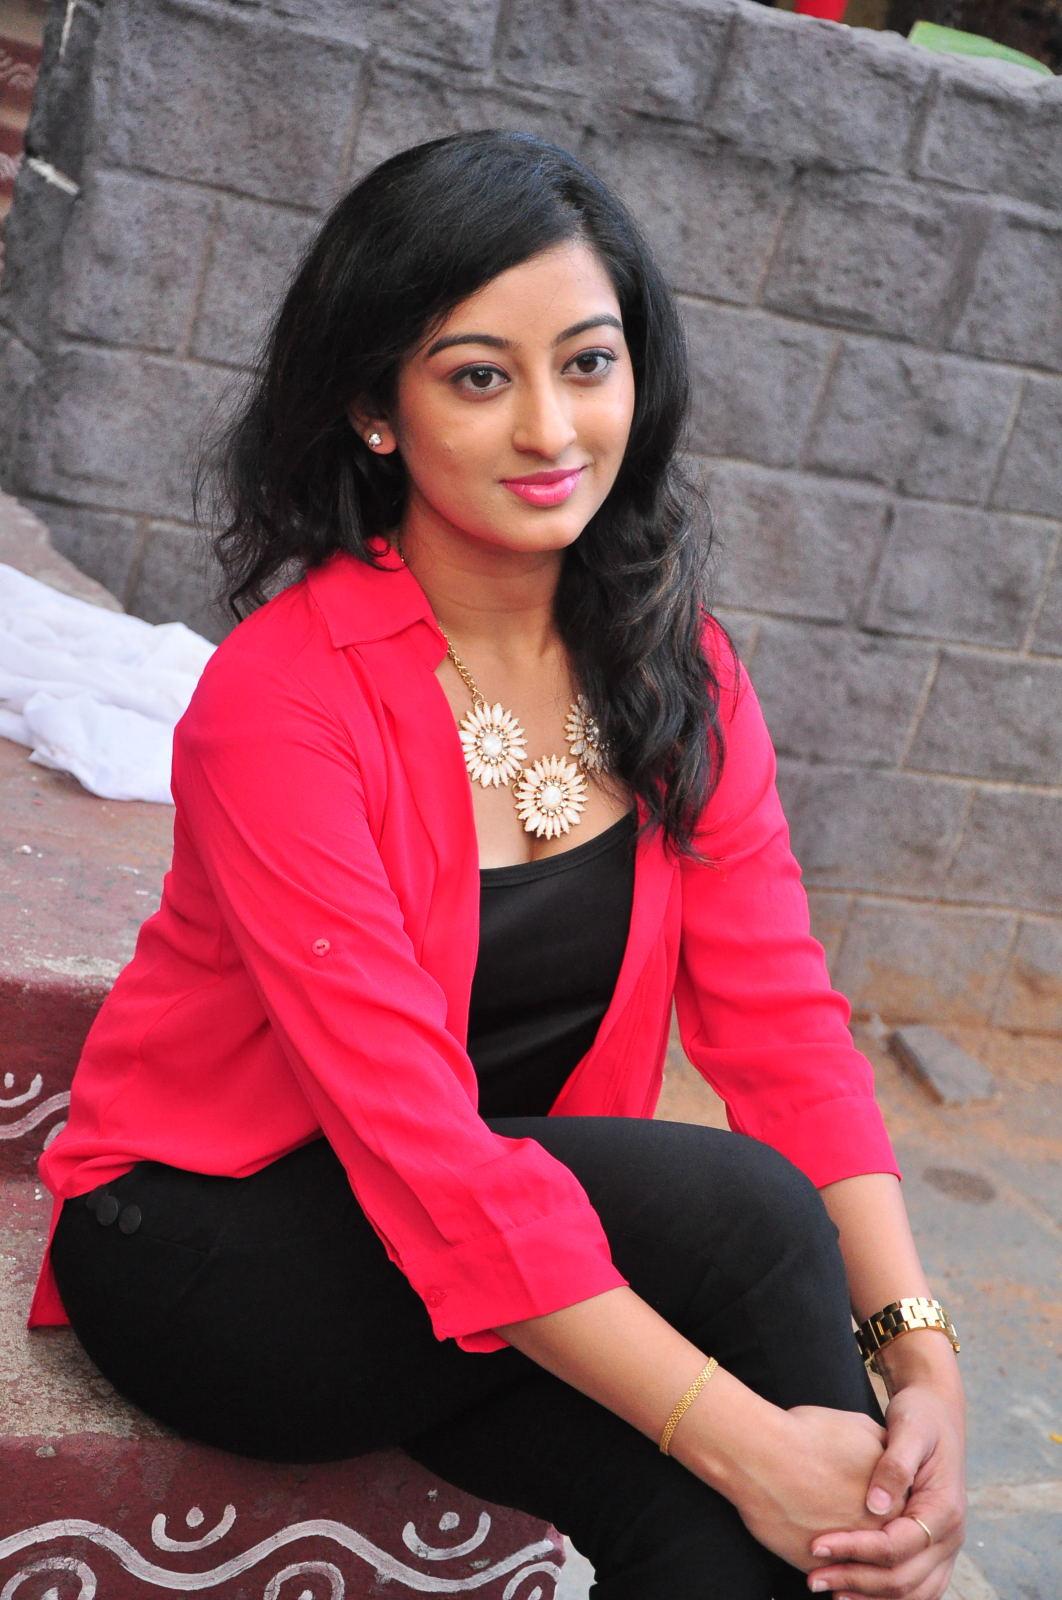 Tejaswini Actress photo,image,pics and stills - # 169767